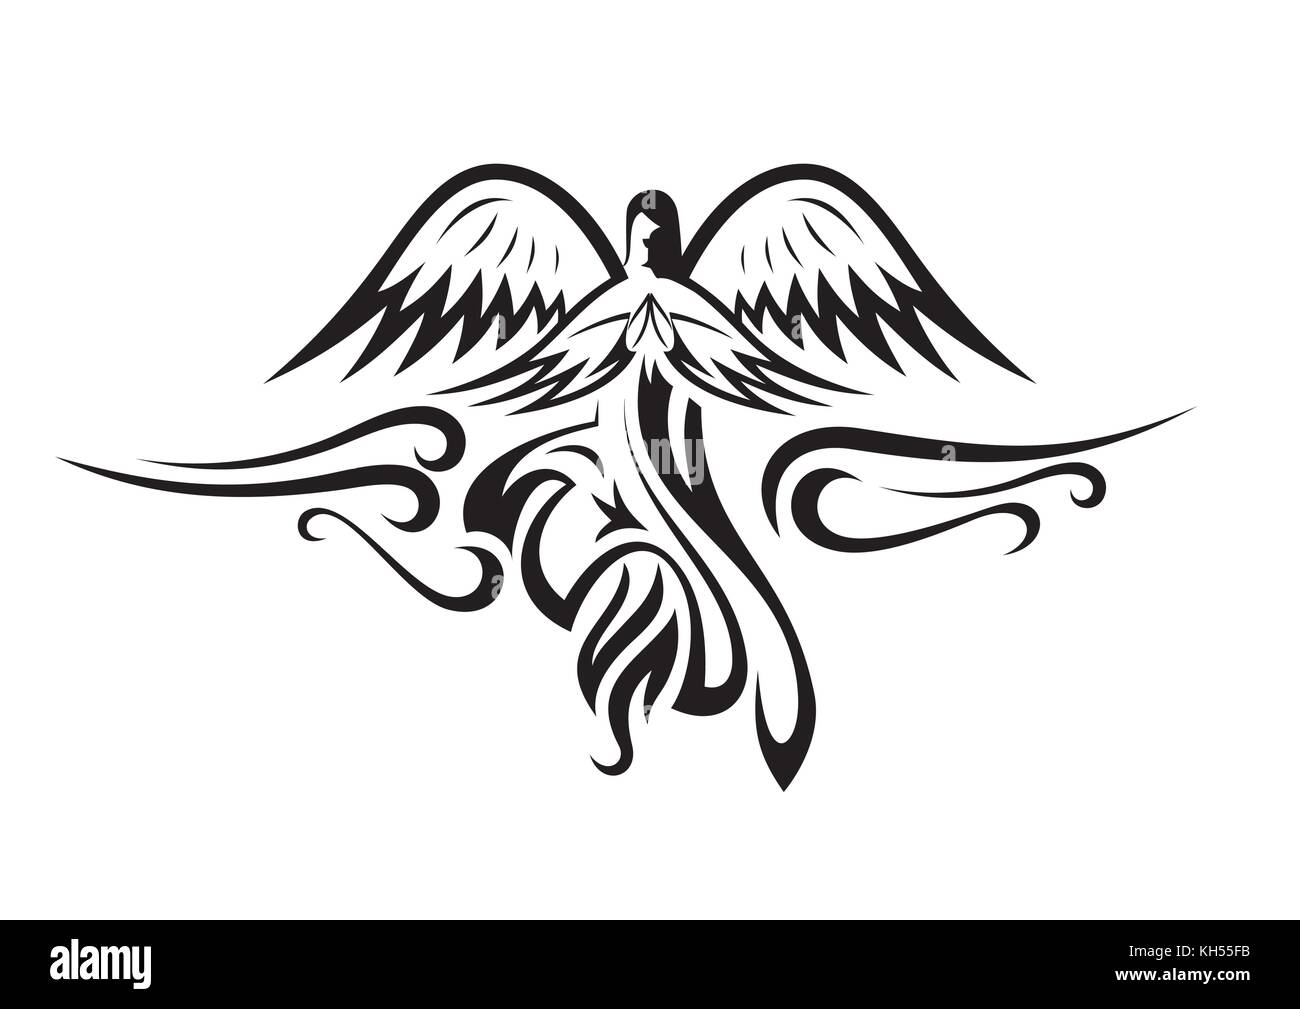 Silhouette flying angel stock photos silhouette flying angel black and white angel silhouette isolated vector stock image biocorpaavc